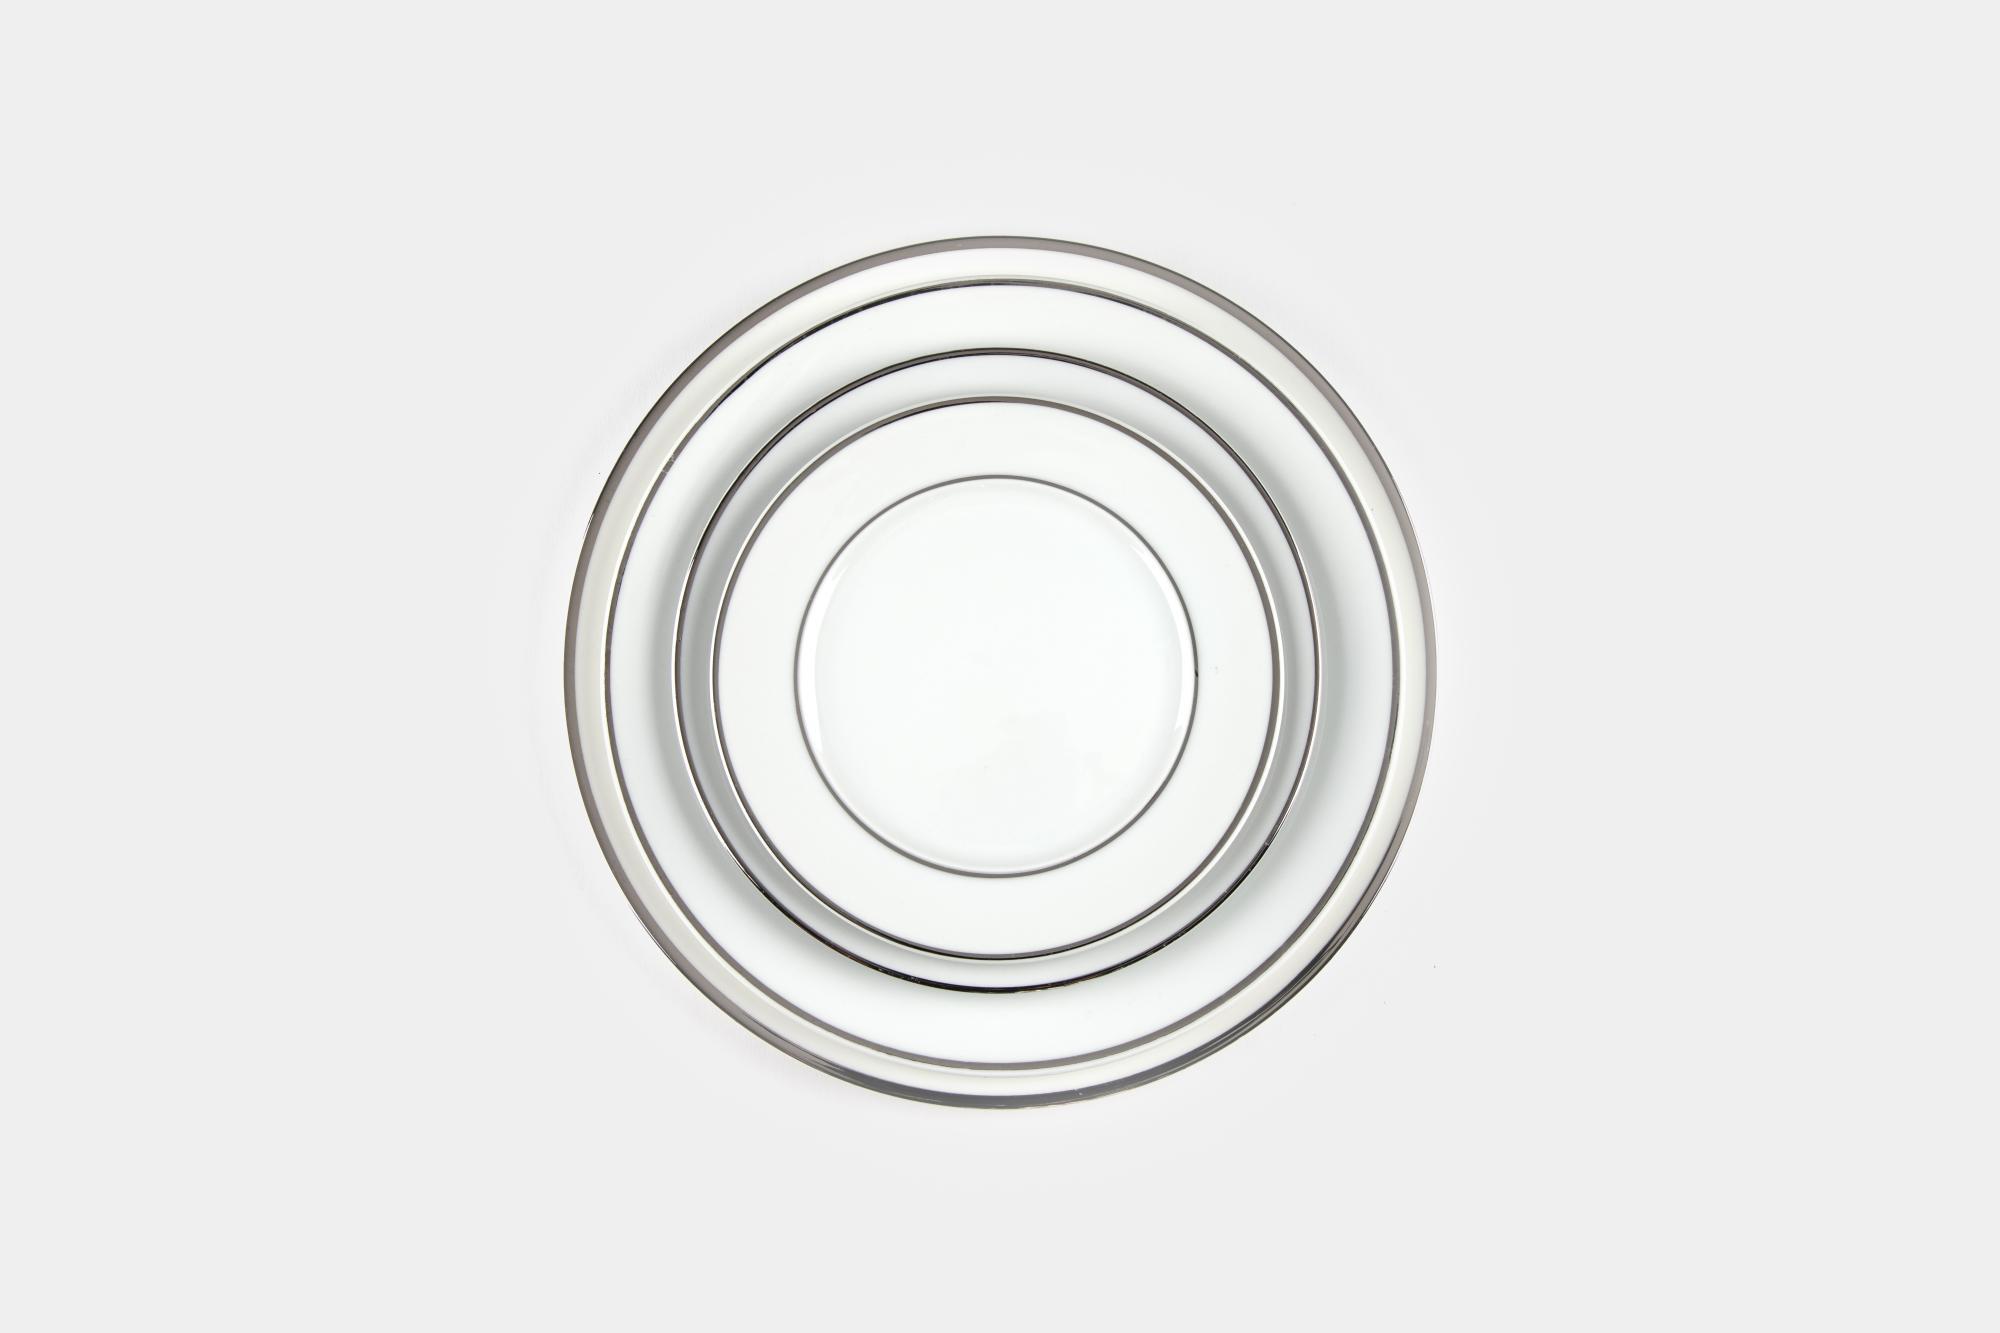 Ionia plate set - Image 0